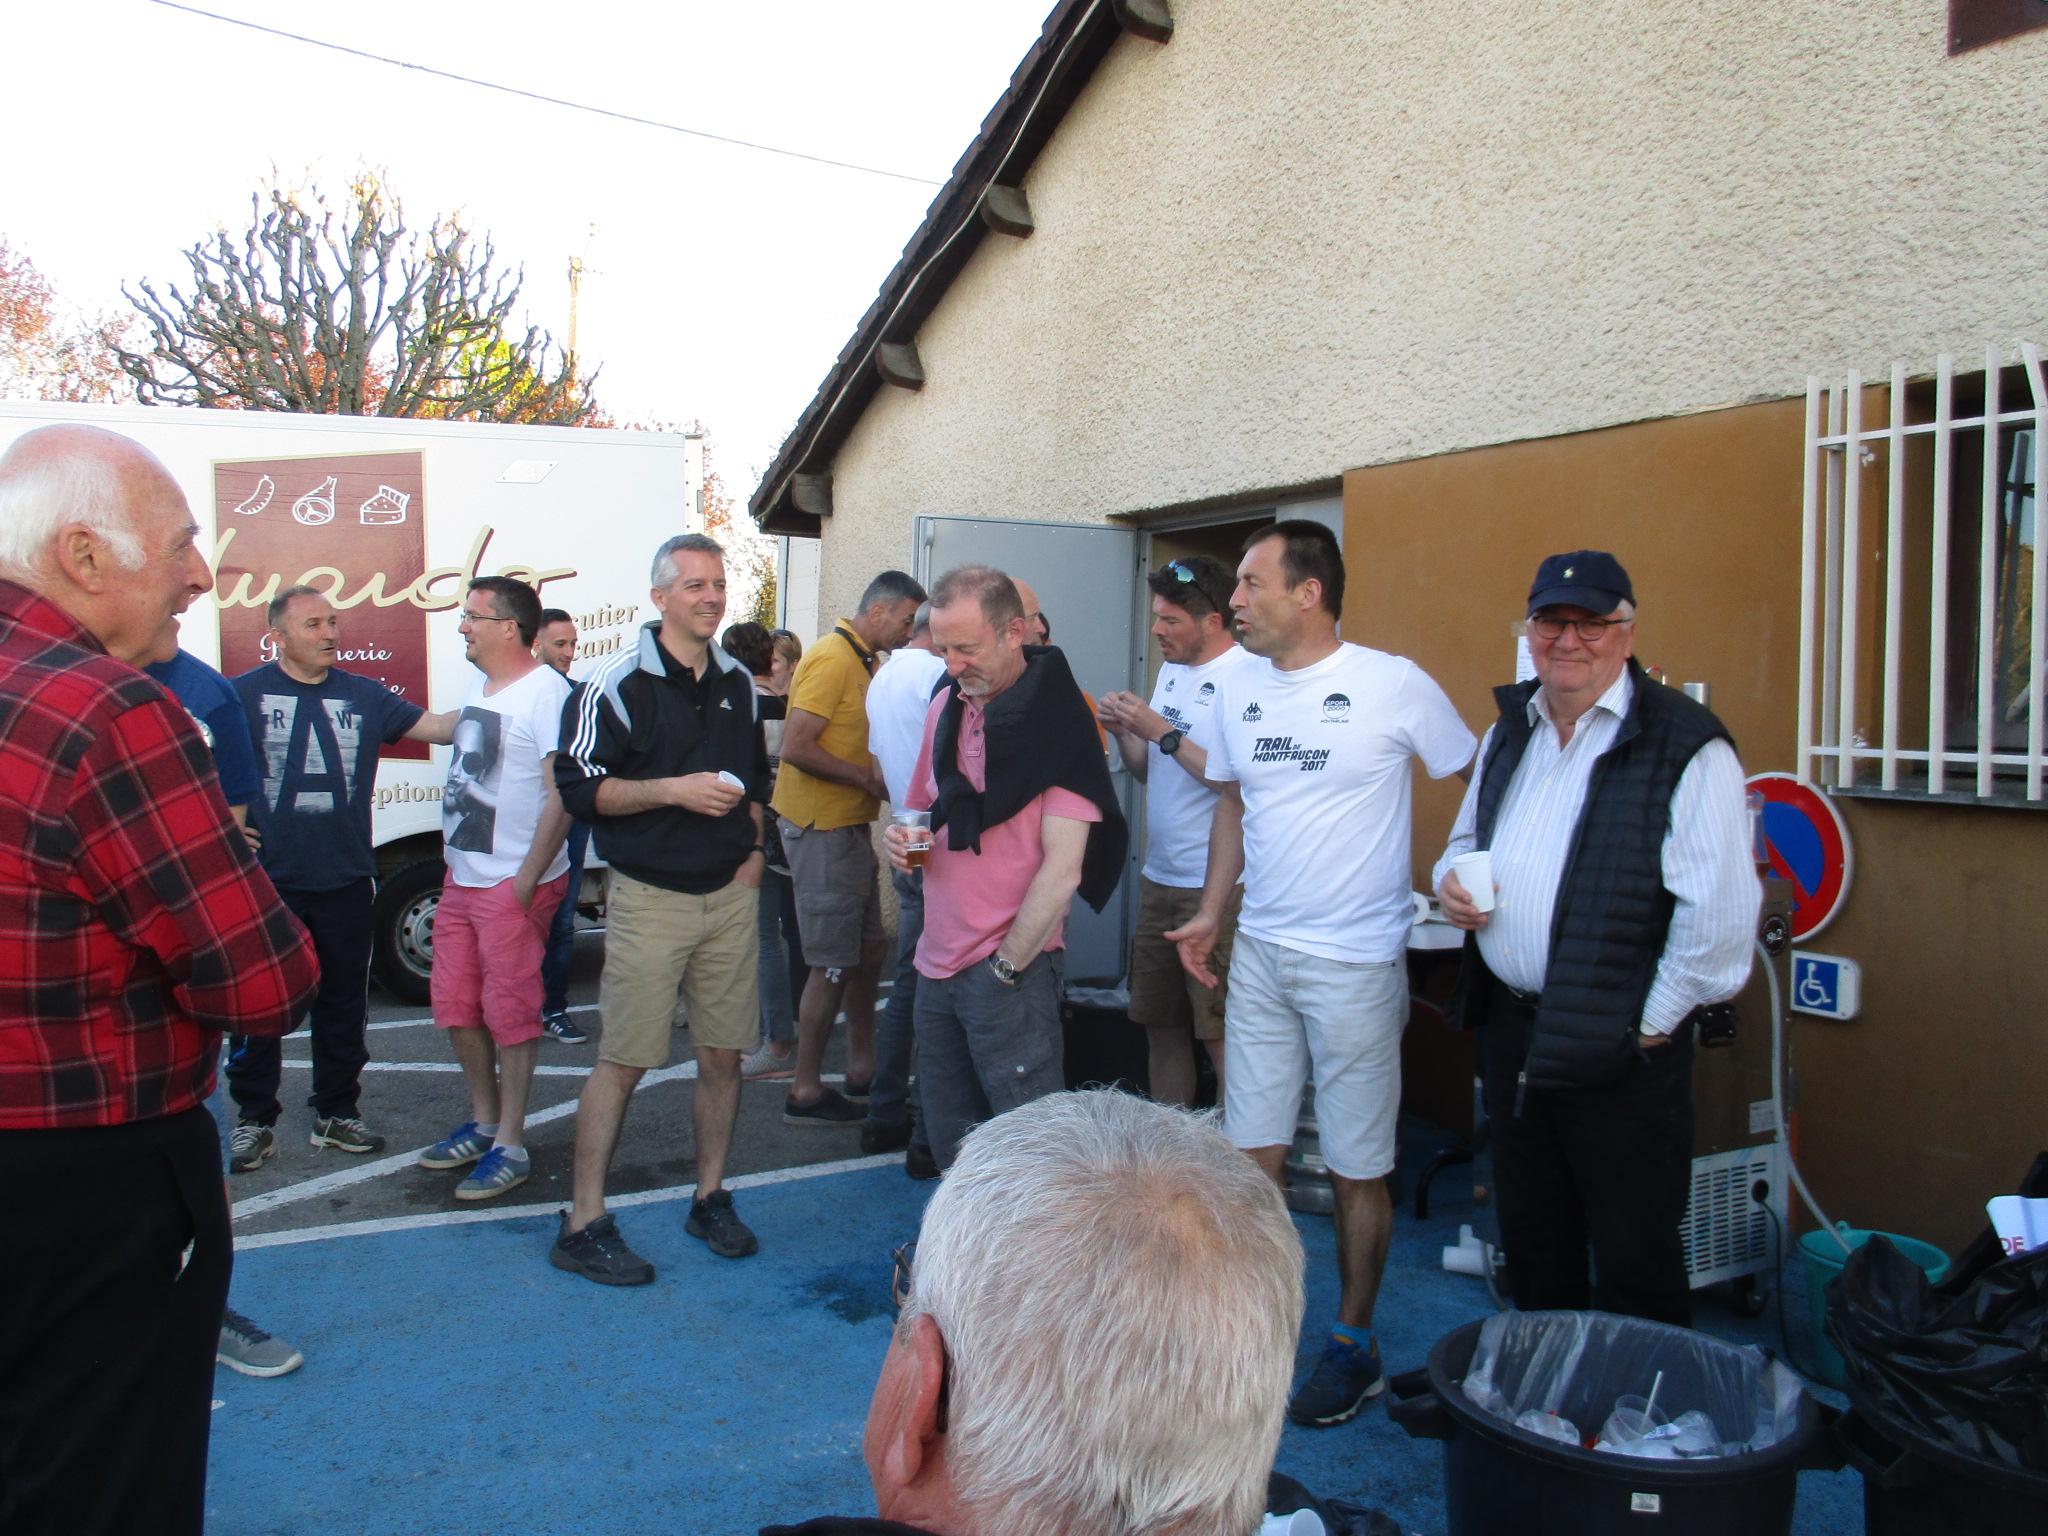 2017-04-09 - Trail-Montfaucon-Ducros (2)